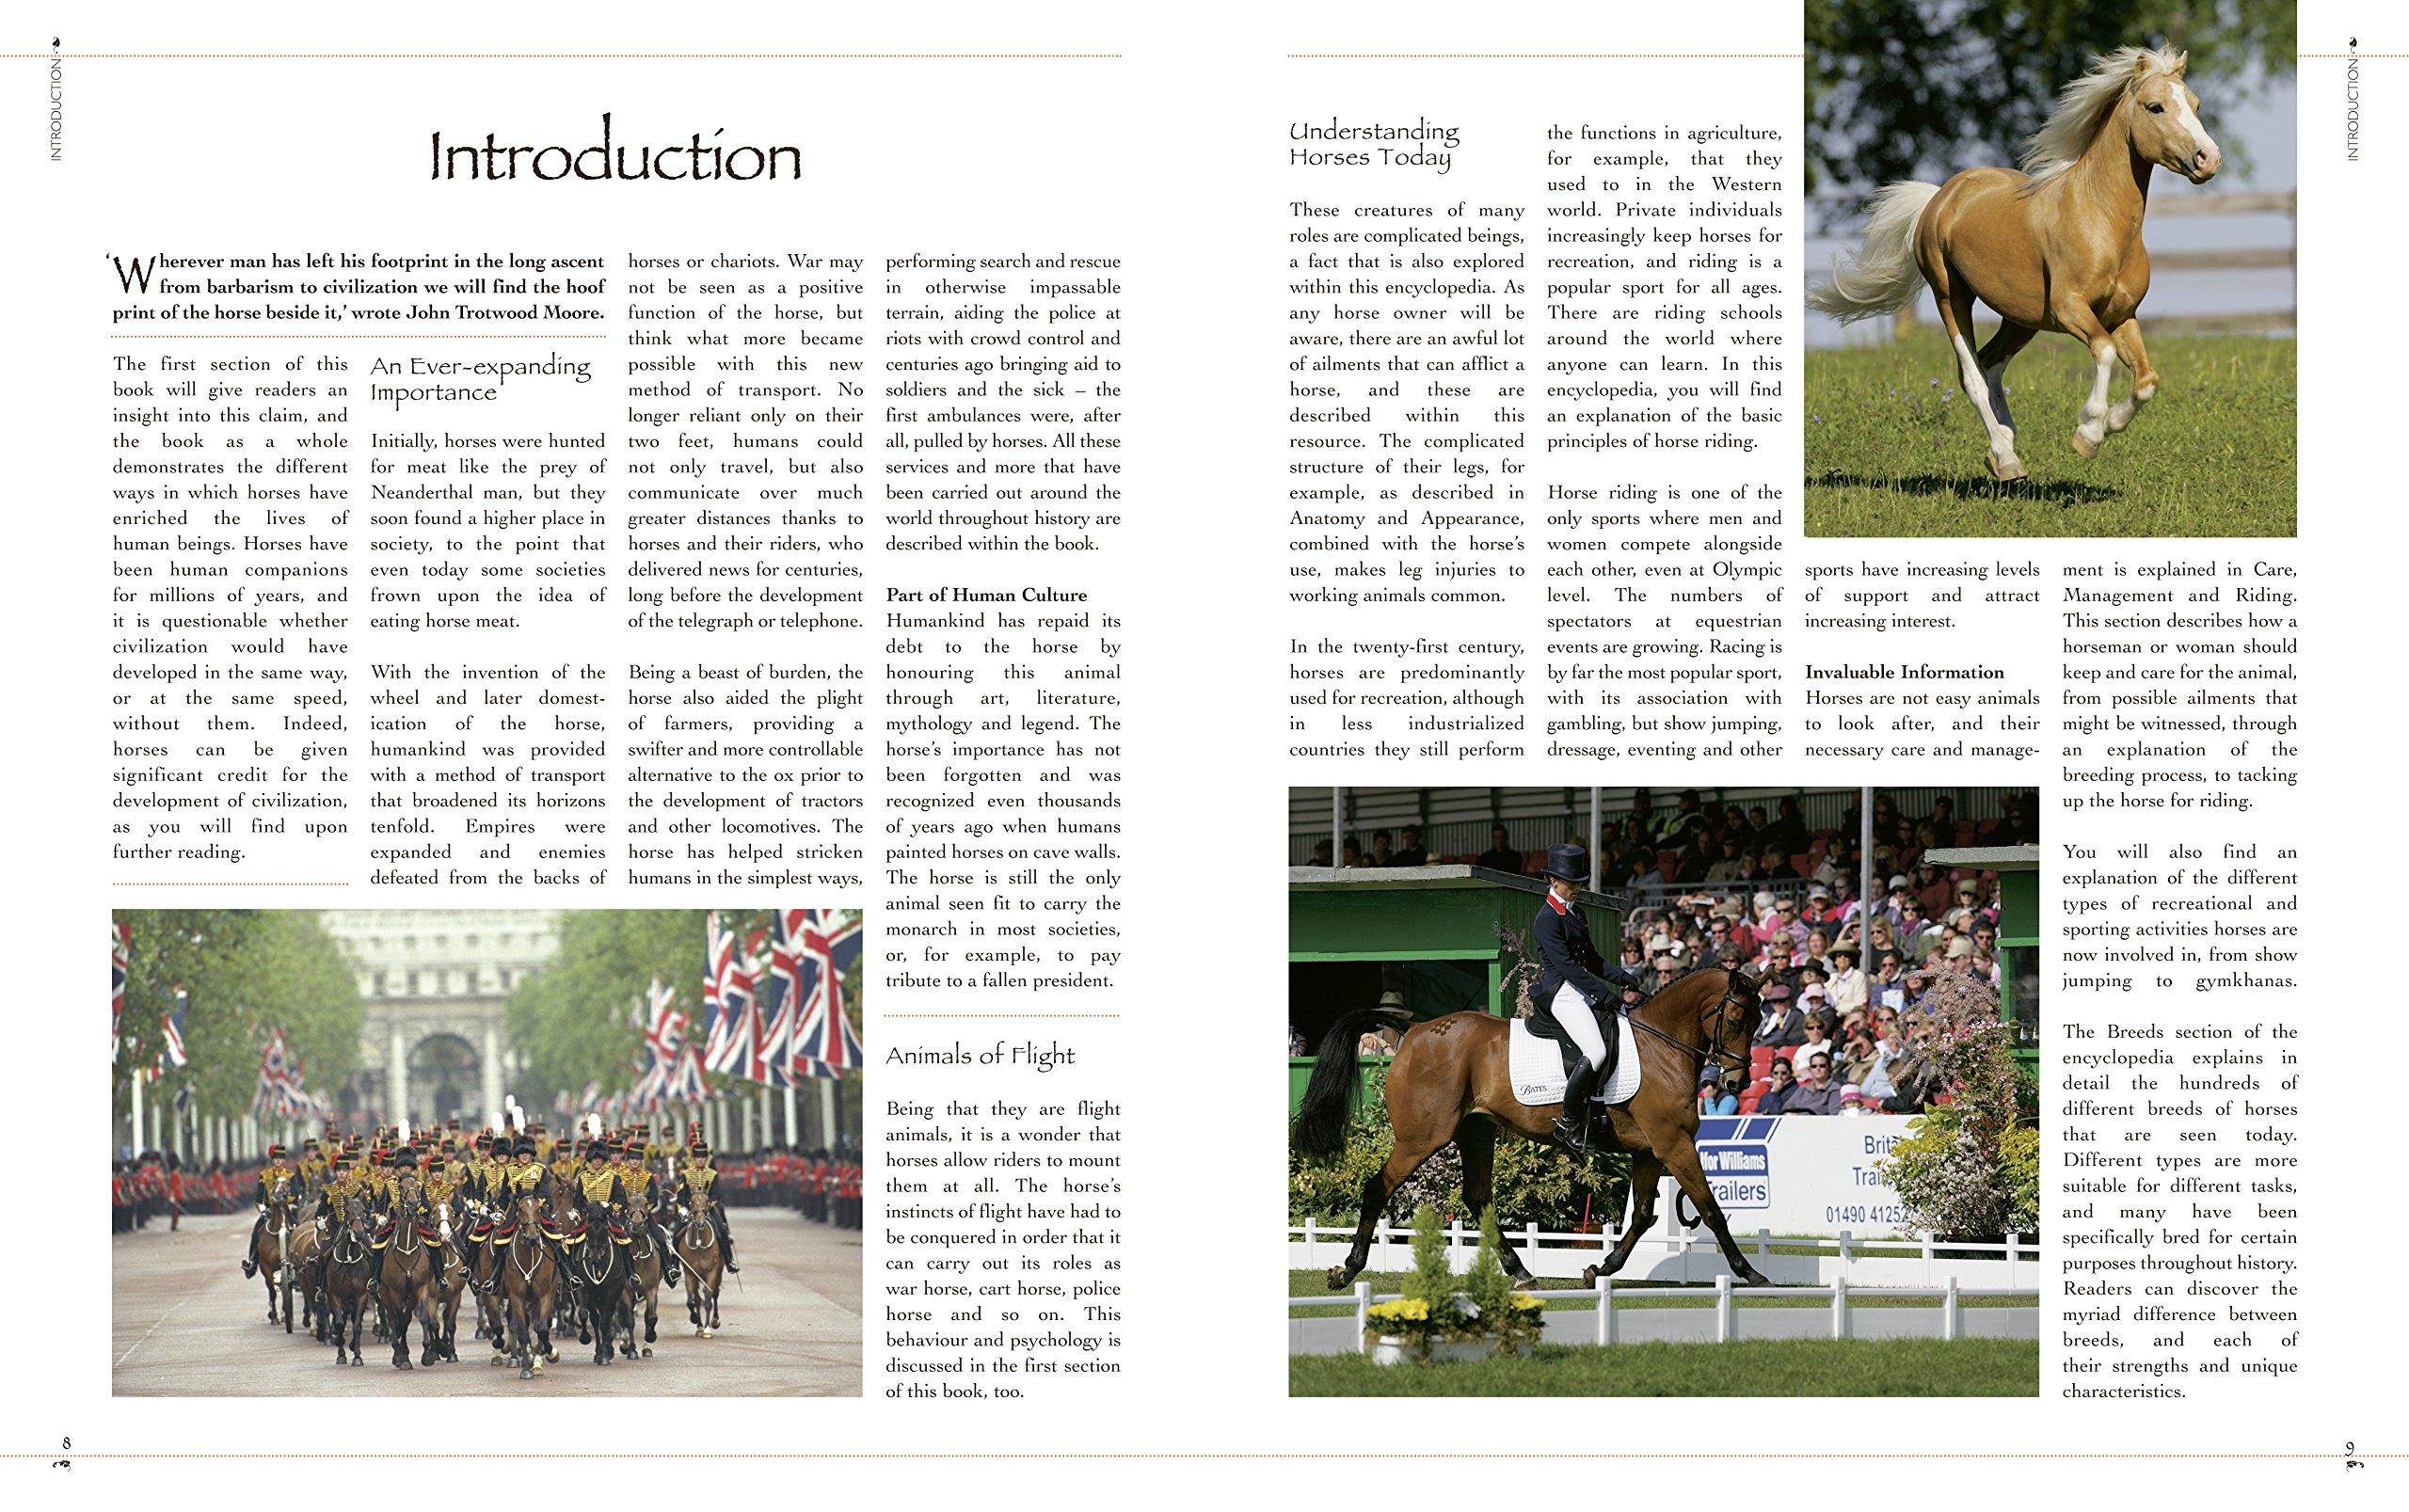 The Complete Illustrated Encyclopedia of Horses & Ponies: Catherine Austen,  Sarah Corrie, Pippa Roome, Nicola Jane Swinney: 9780857758811: Amazon.com:  Books